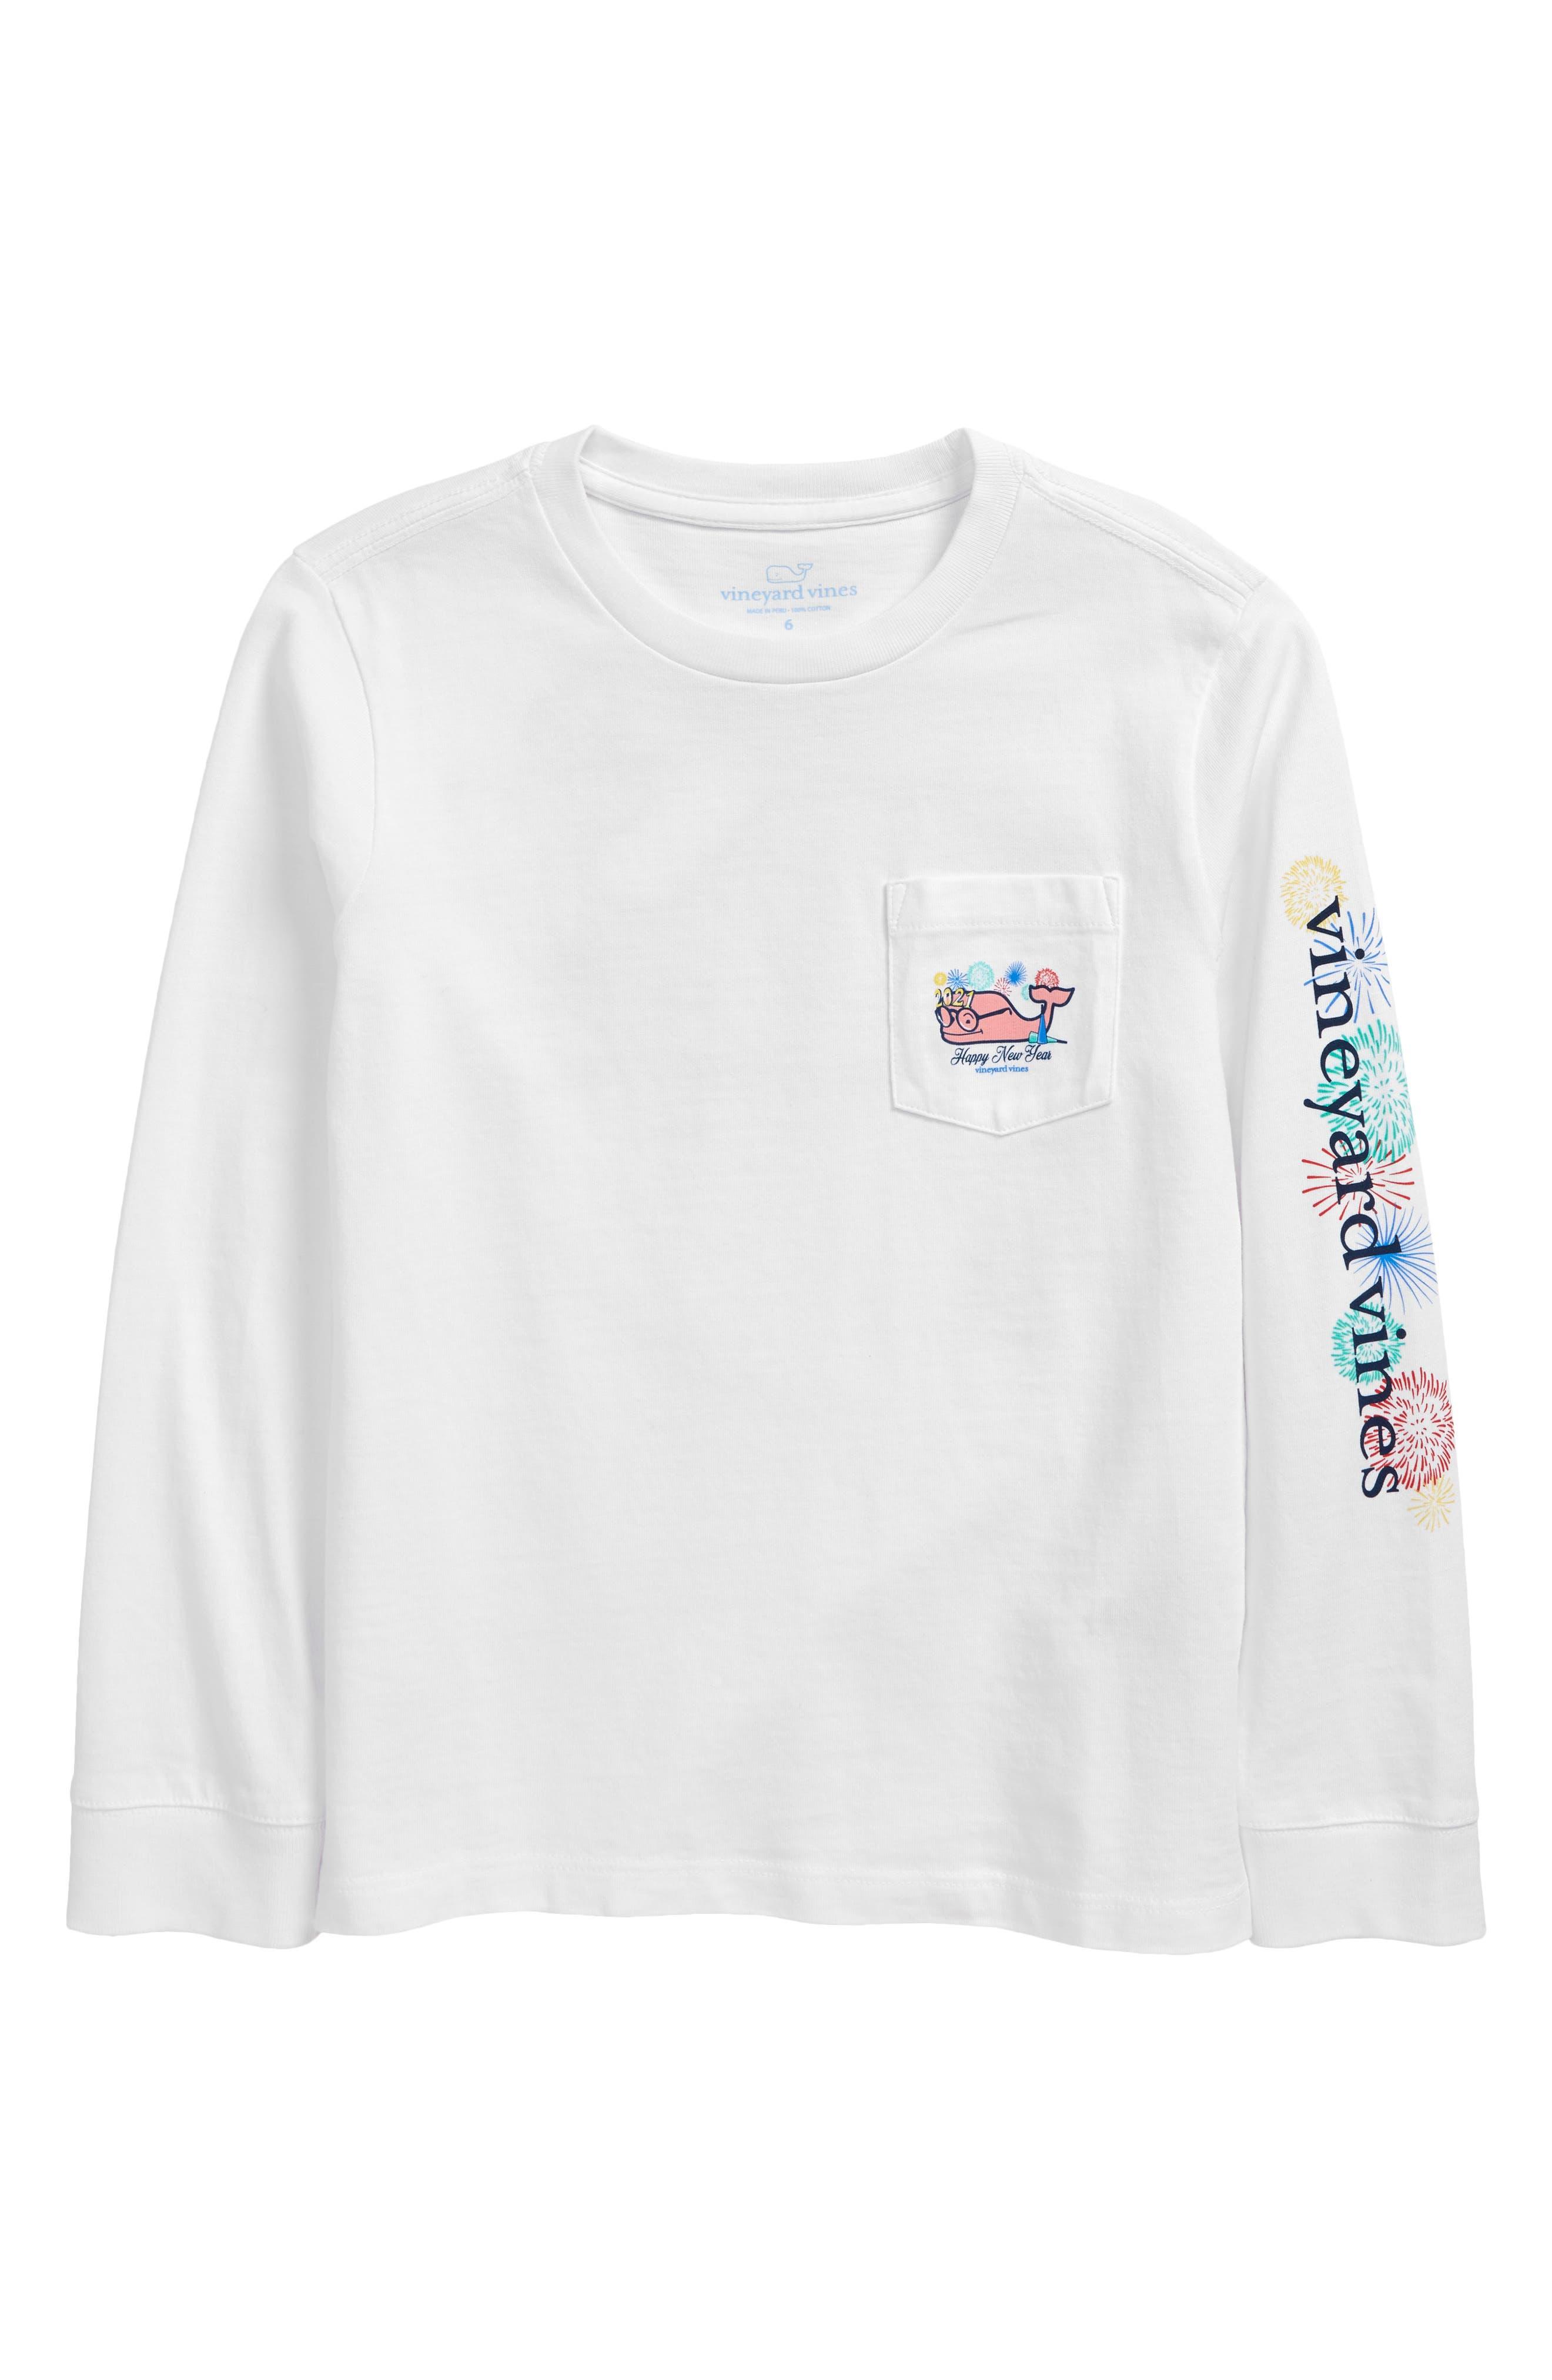 Lonsdale Kids Boys CrstLS Tee Childs Shirt Long Sleeve